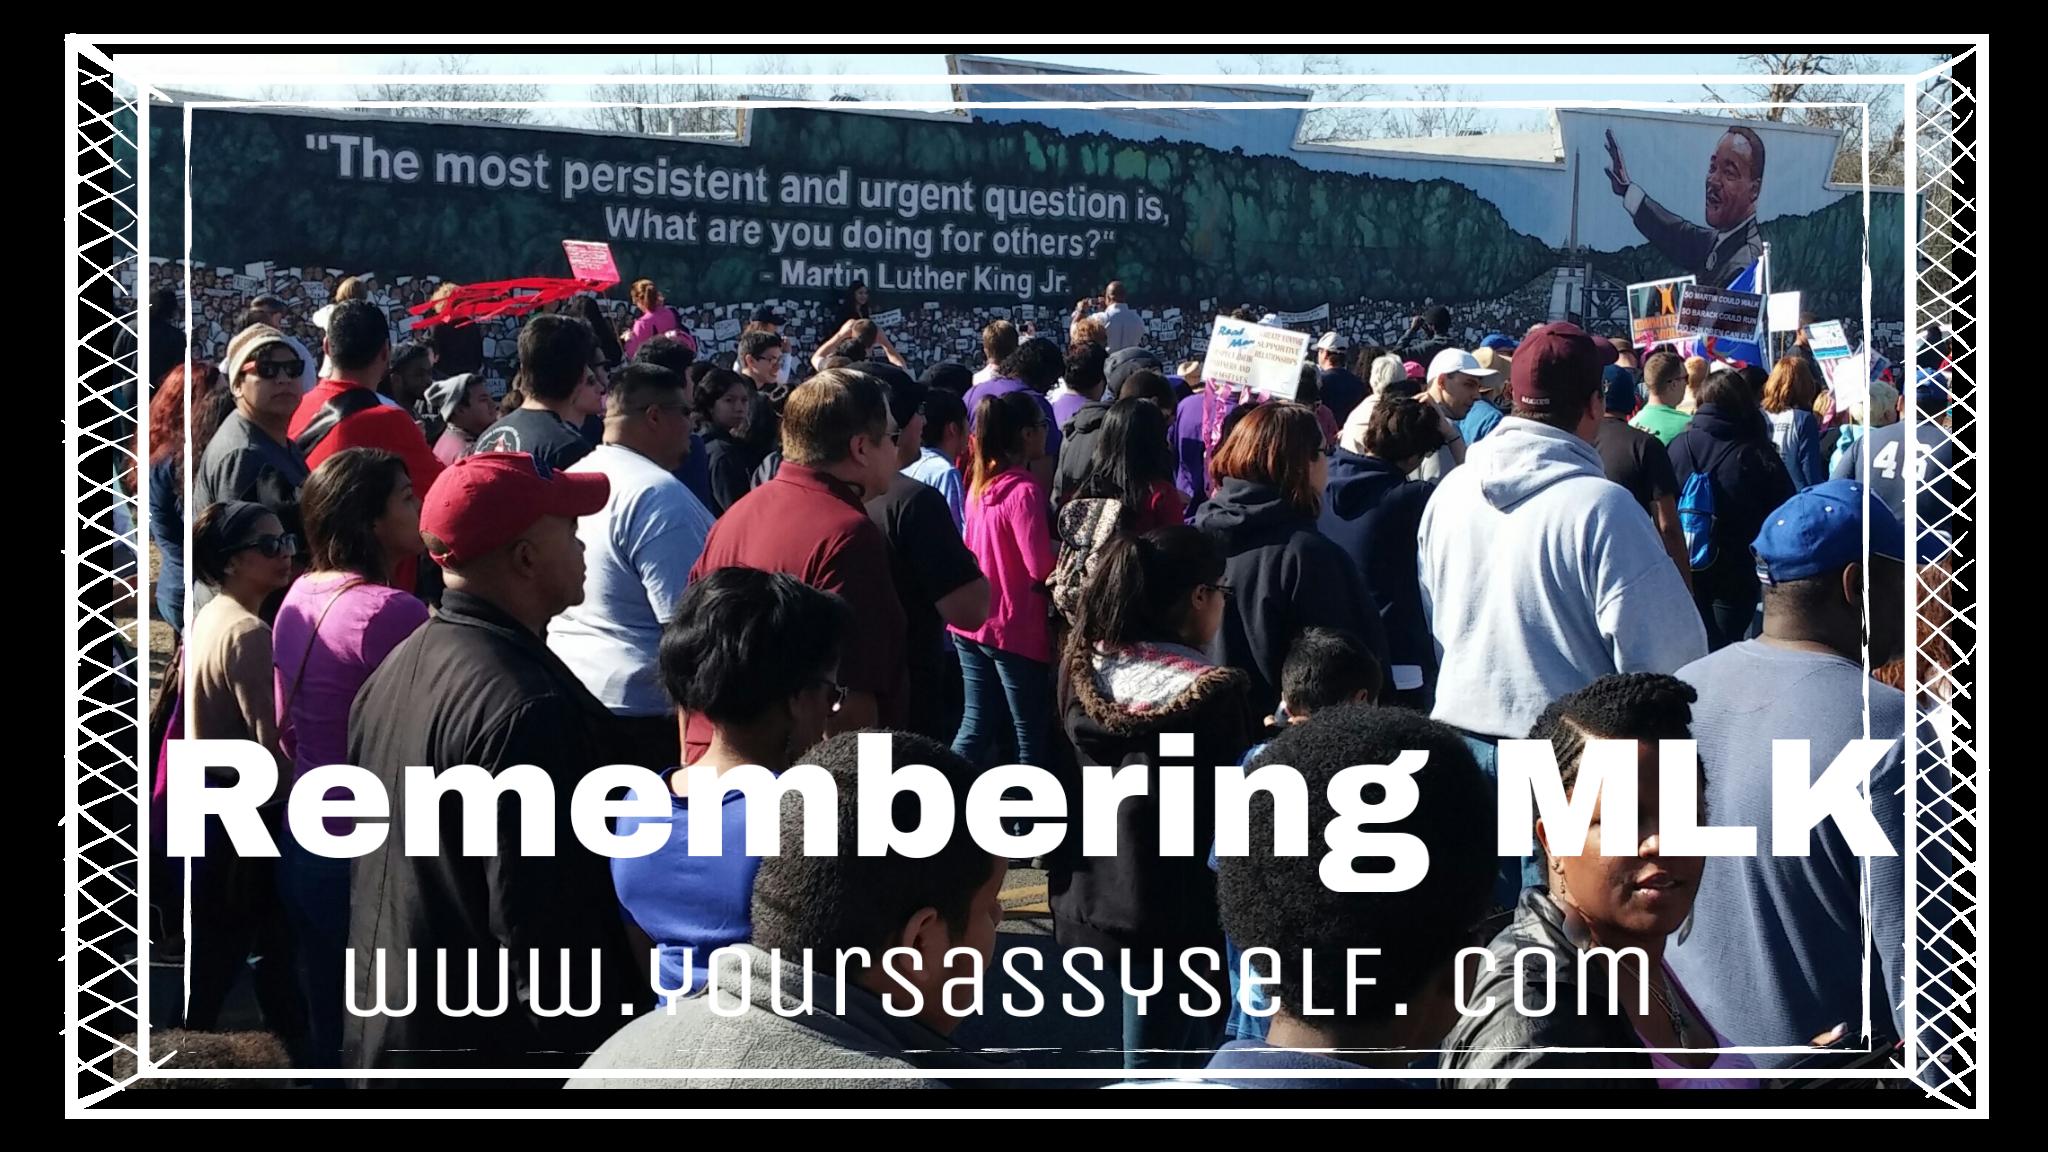 RememberingMLK-yoursassyself.com